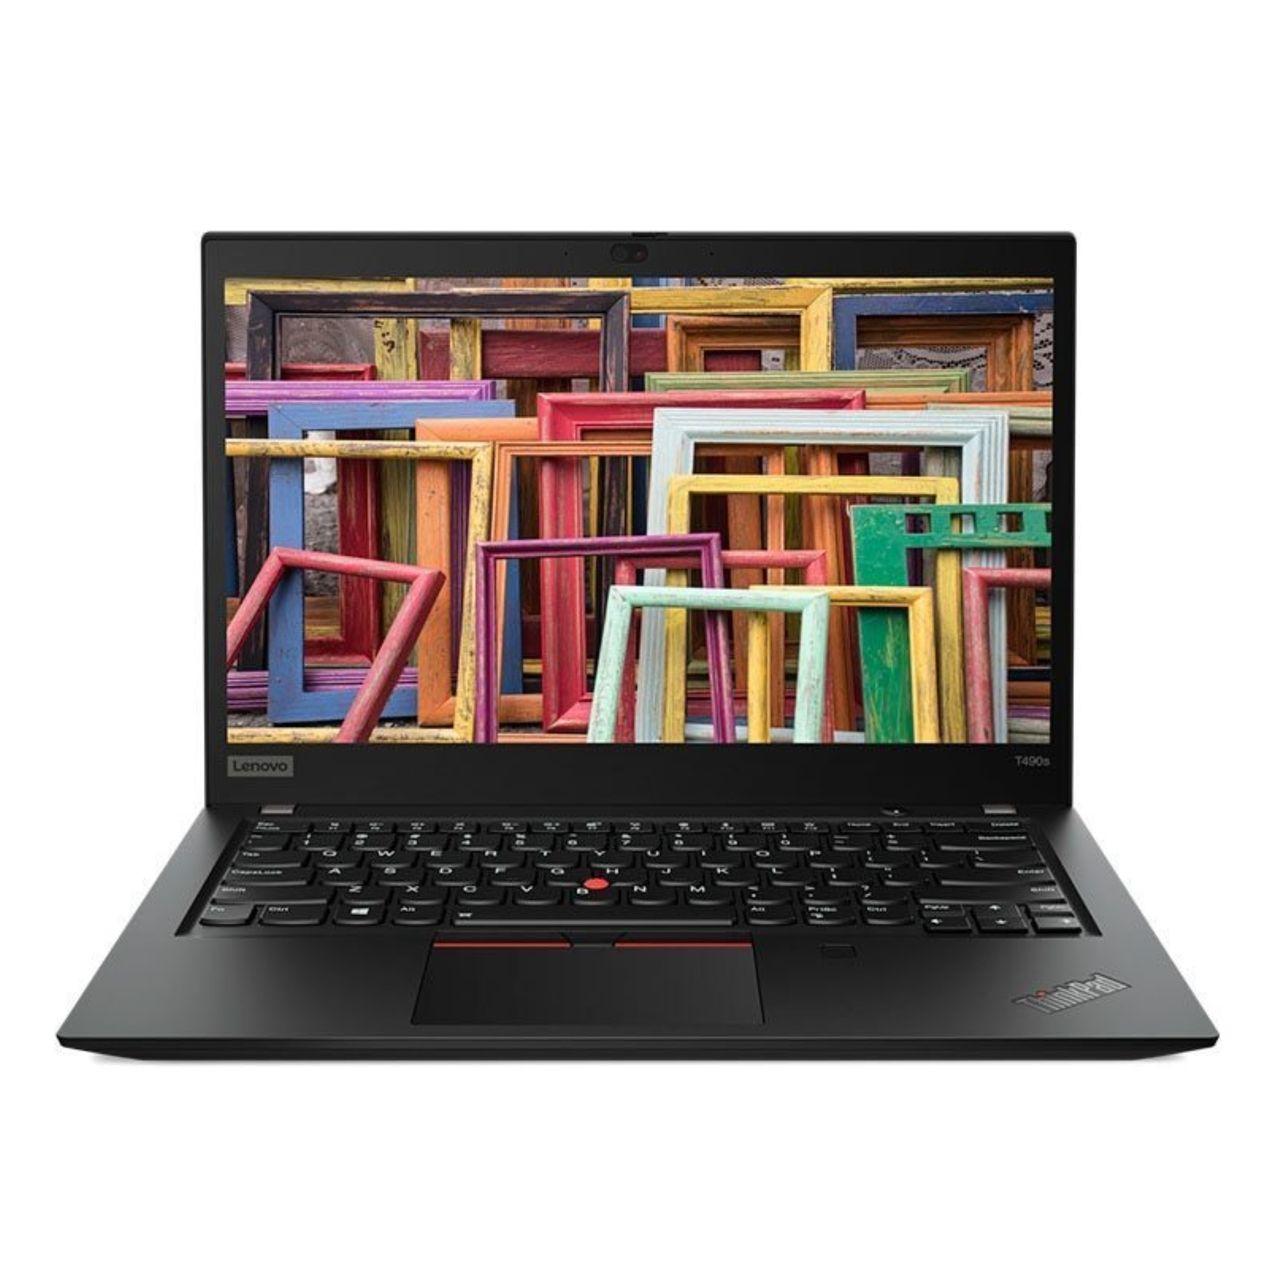 لپ تاپ ۱۴ اینچی لنوو مدل ThinkPad T490S